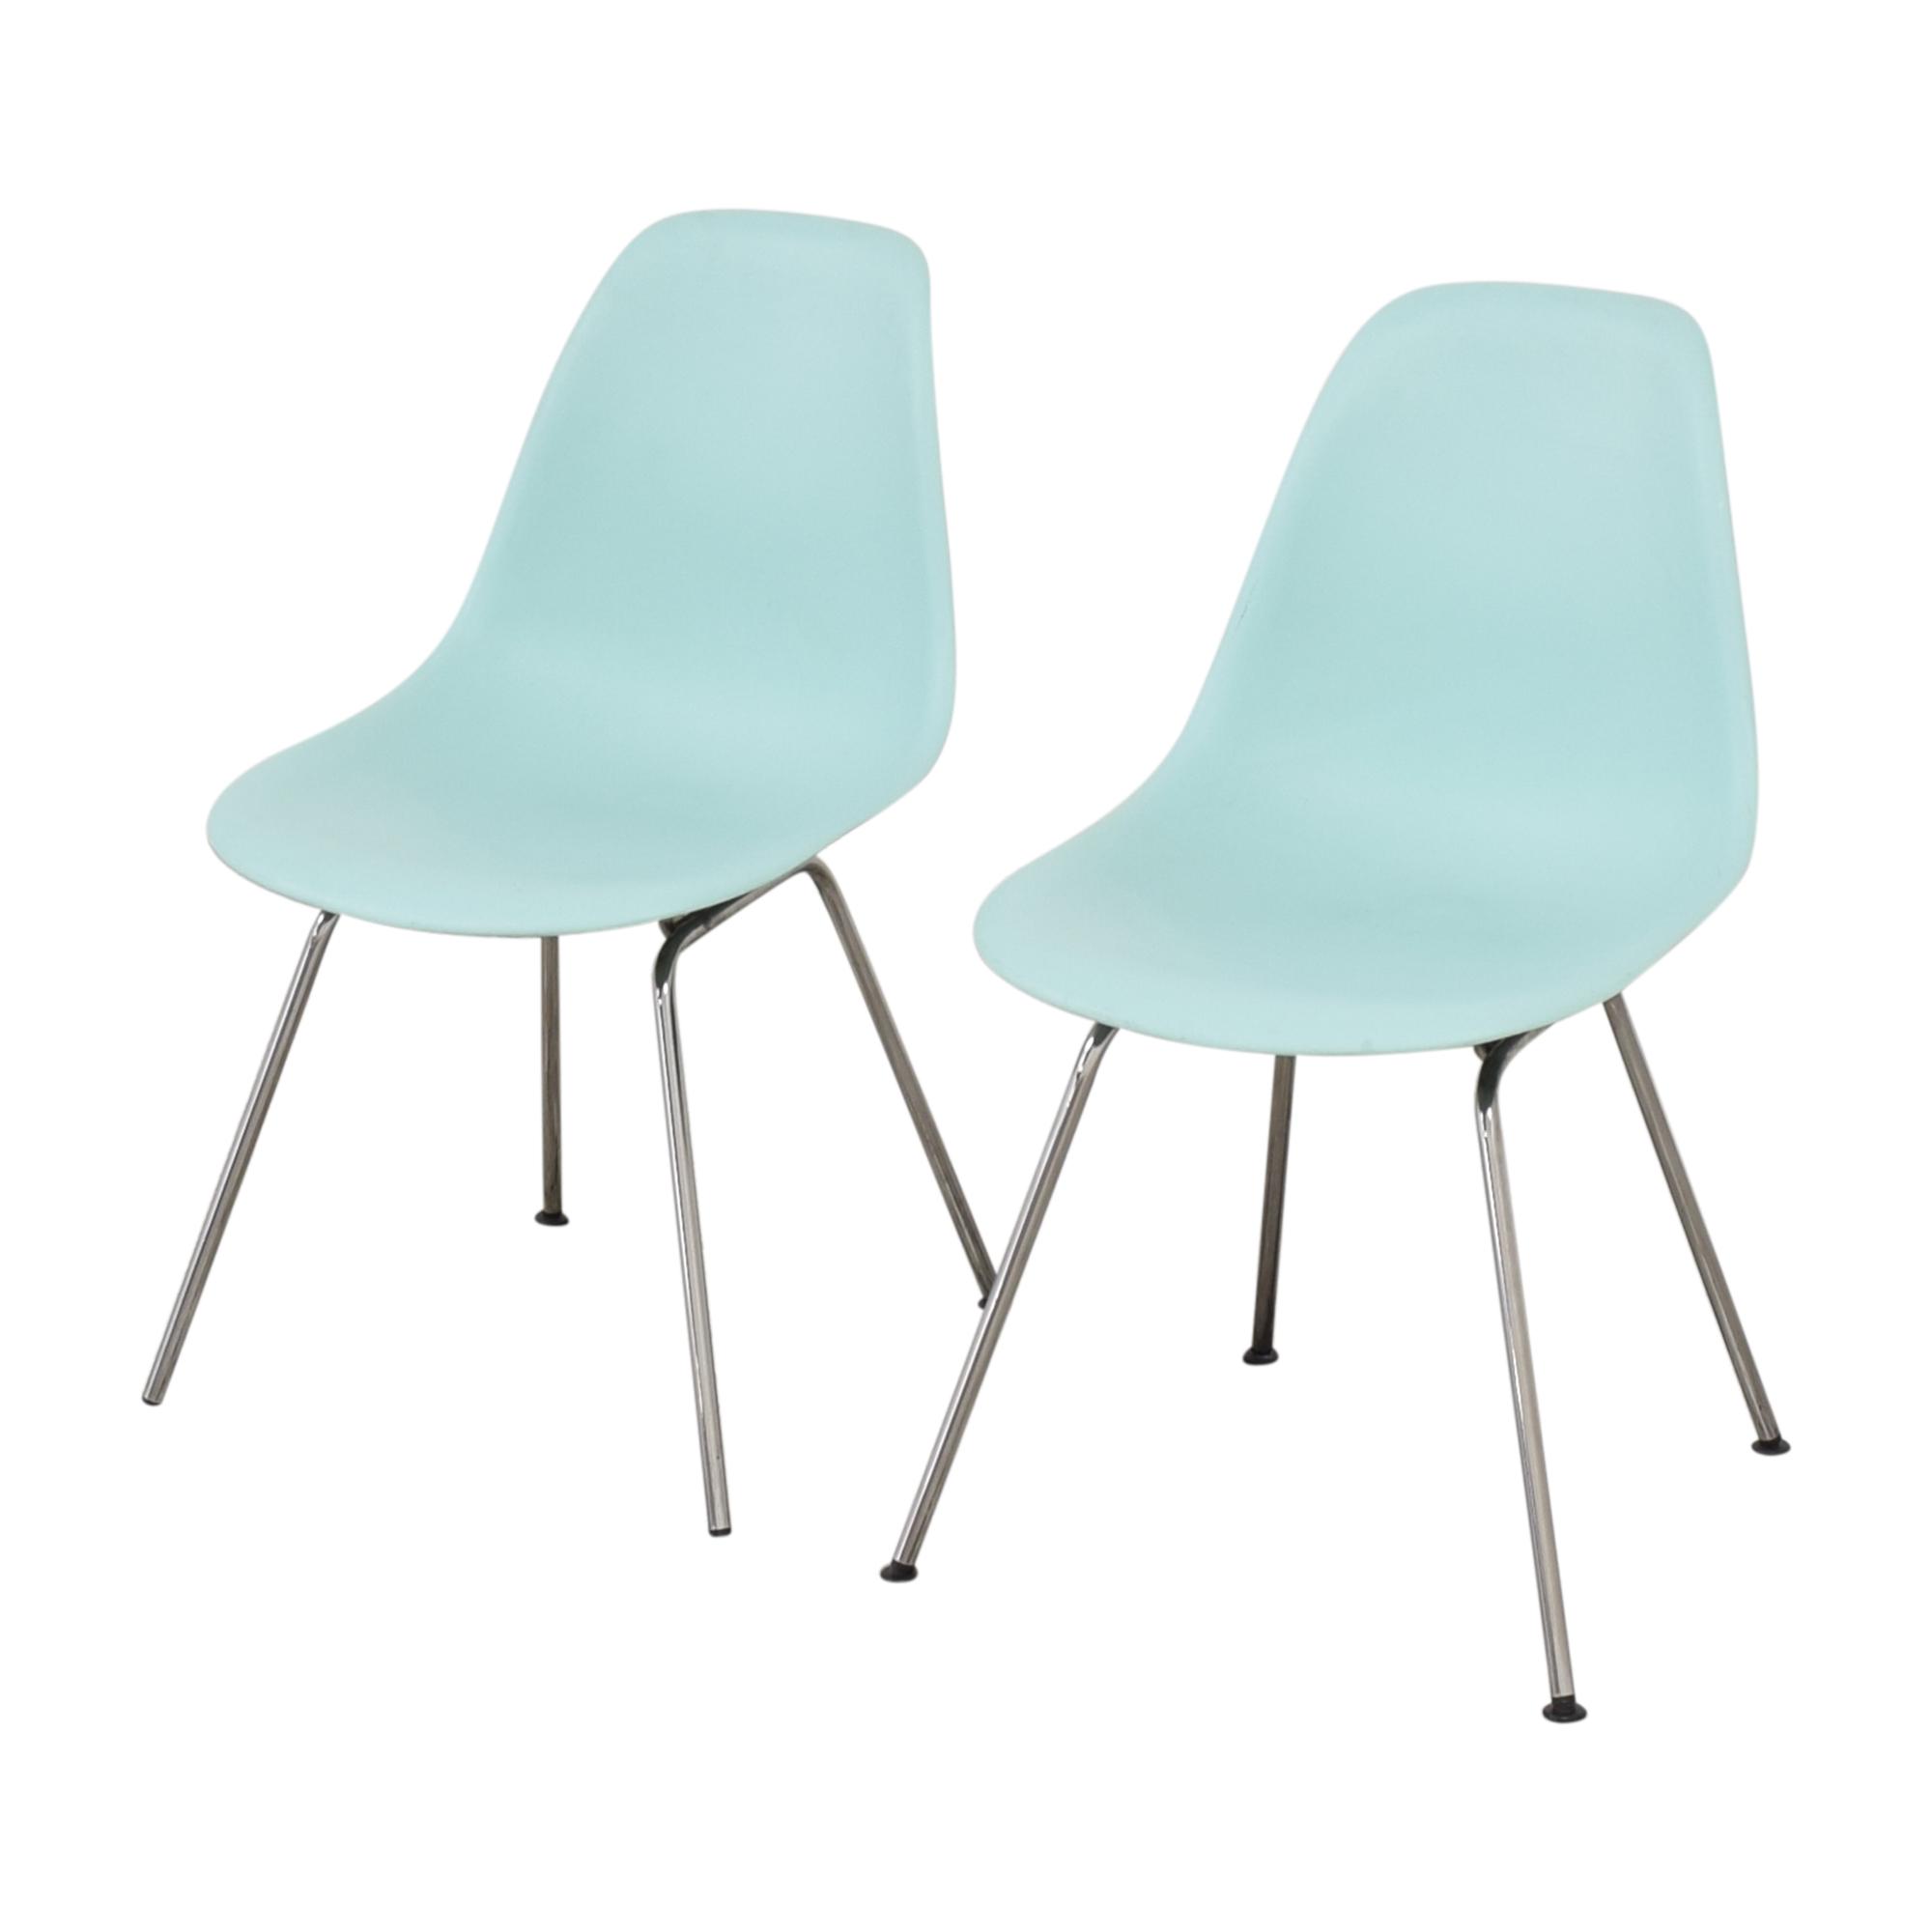 Herman Miller Herman Miller Eames Molded Side Chair, 4-Leg Base for sale